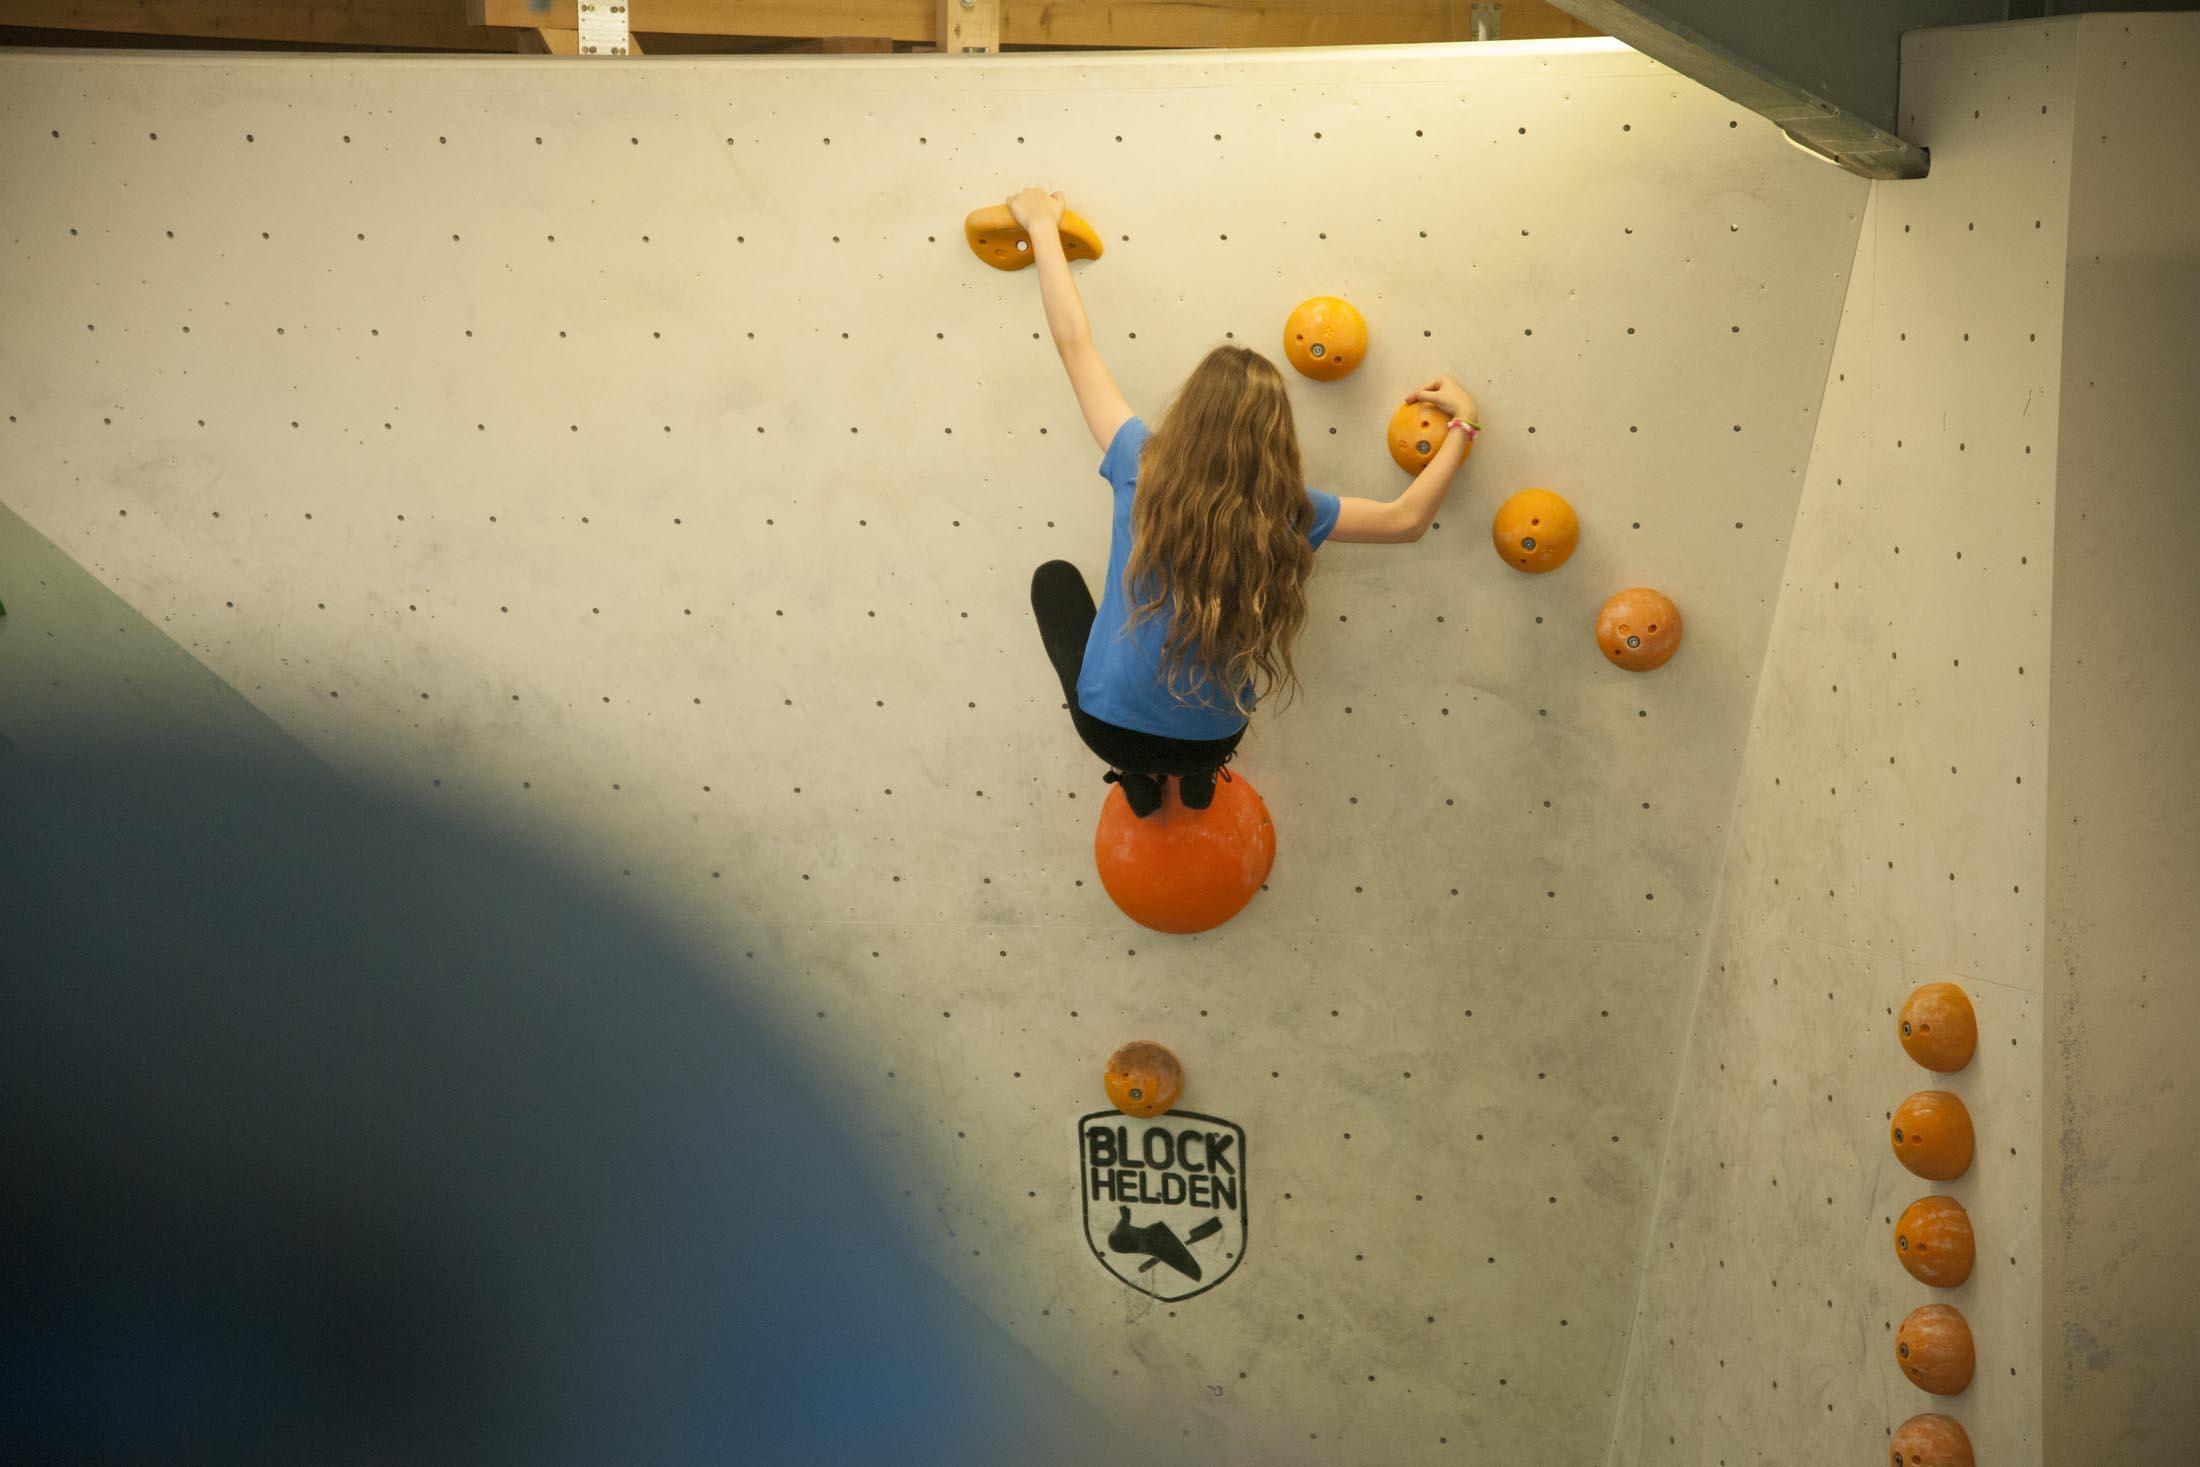 Quali, internationaler bouldercup Frankenjura 2016, BLOCKHELDEN Erlangen, Mammut, Bergfreunde.de, Boulderwettkampf07092016135